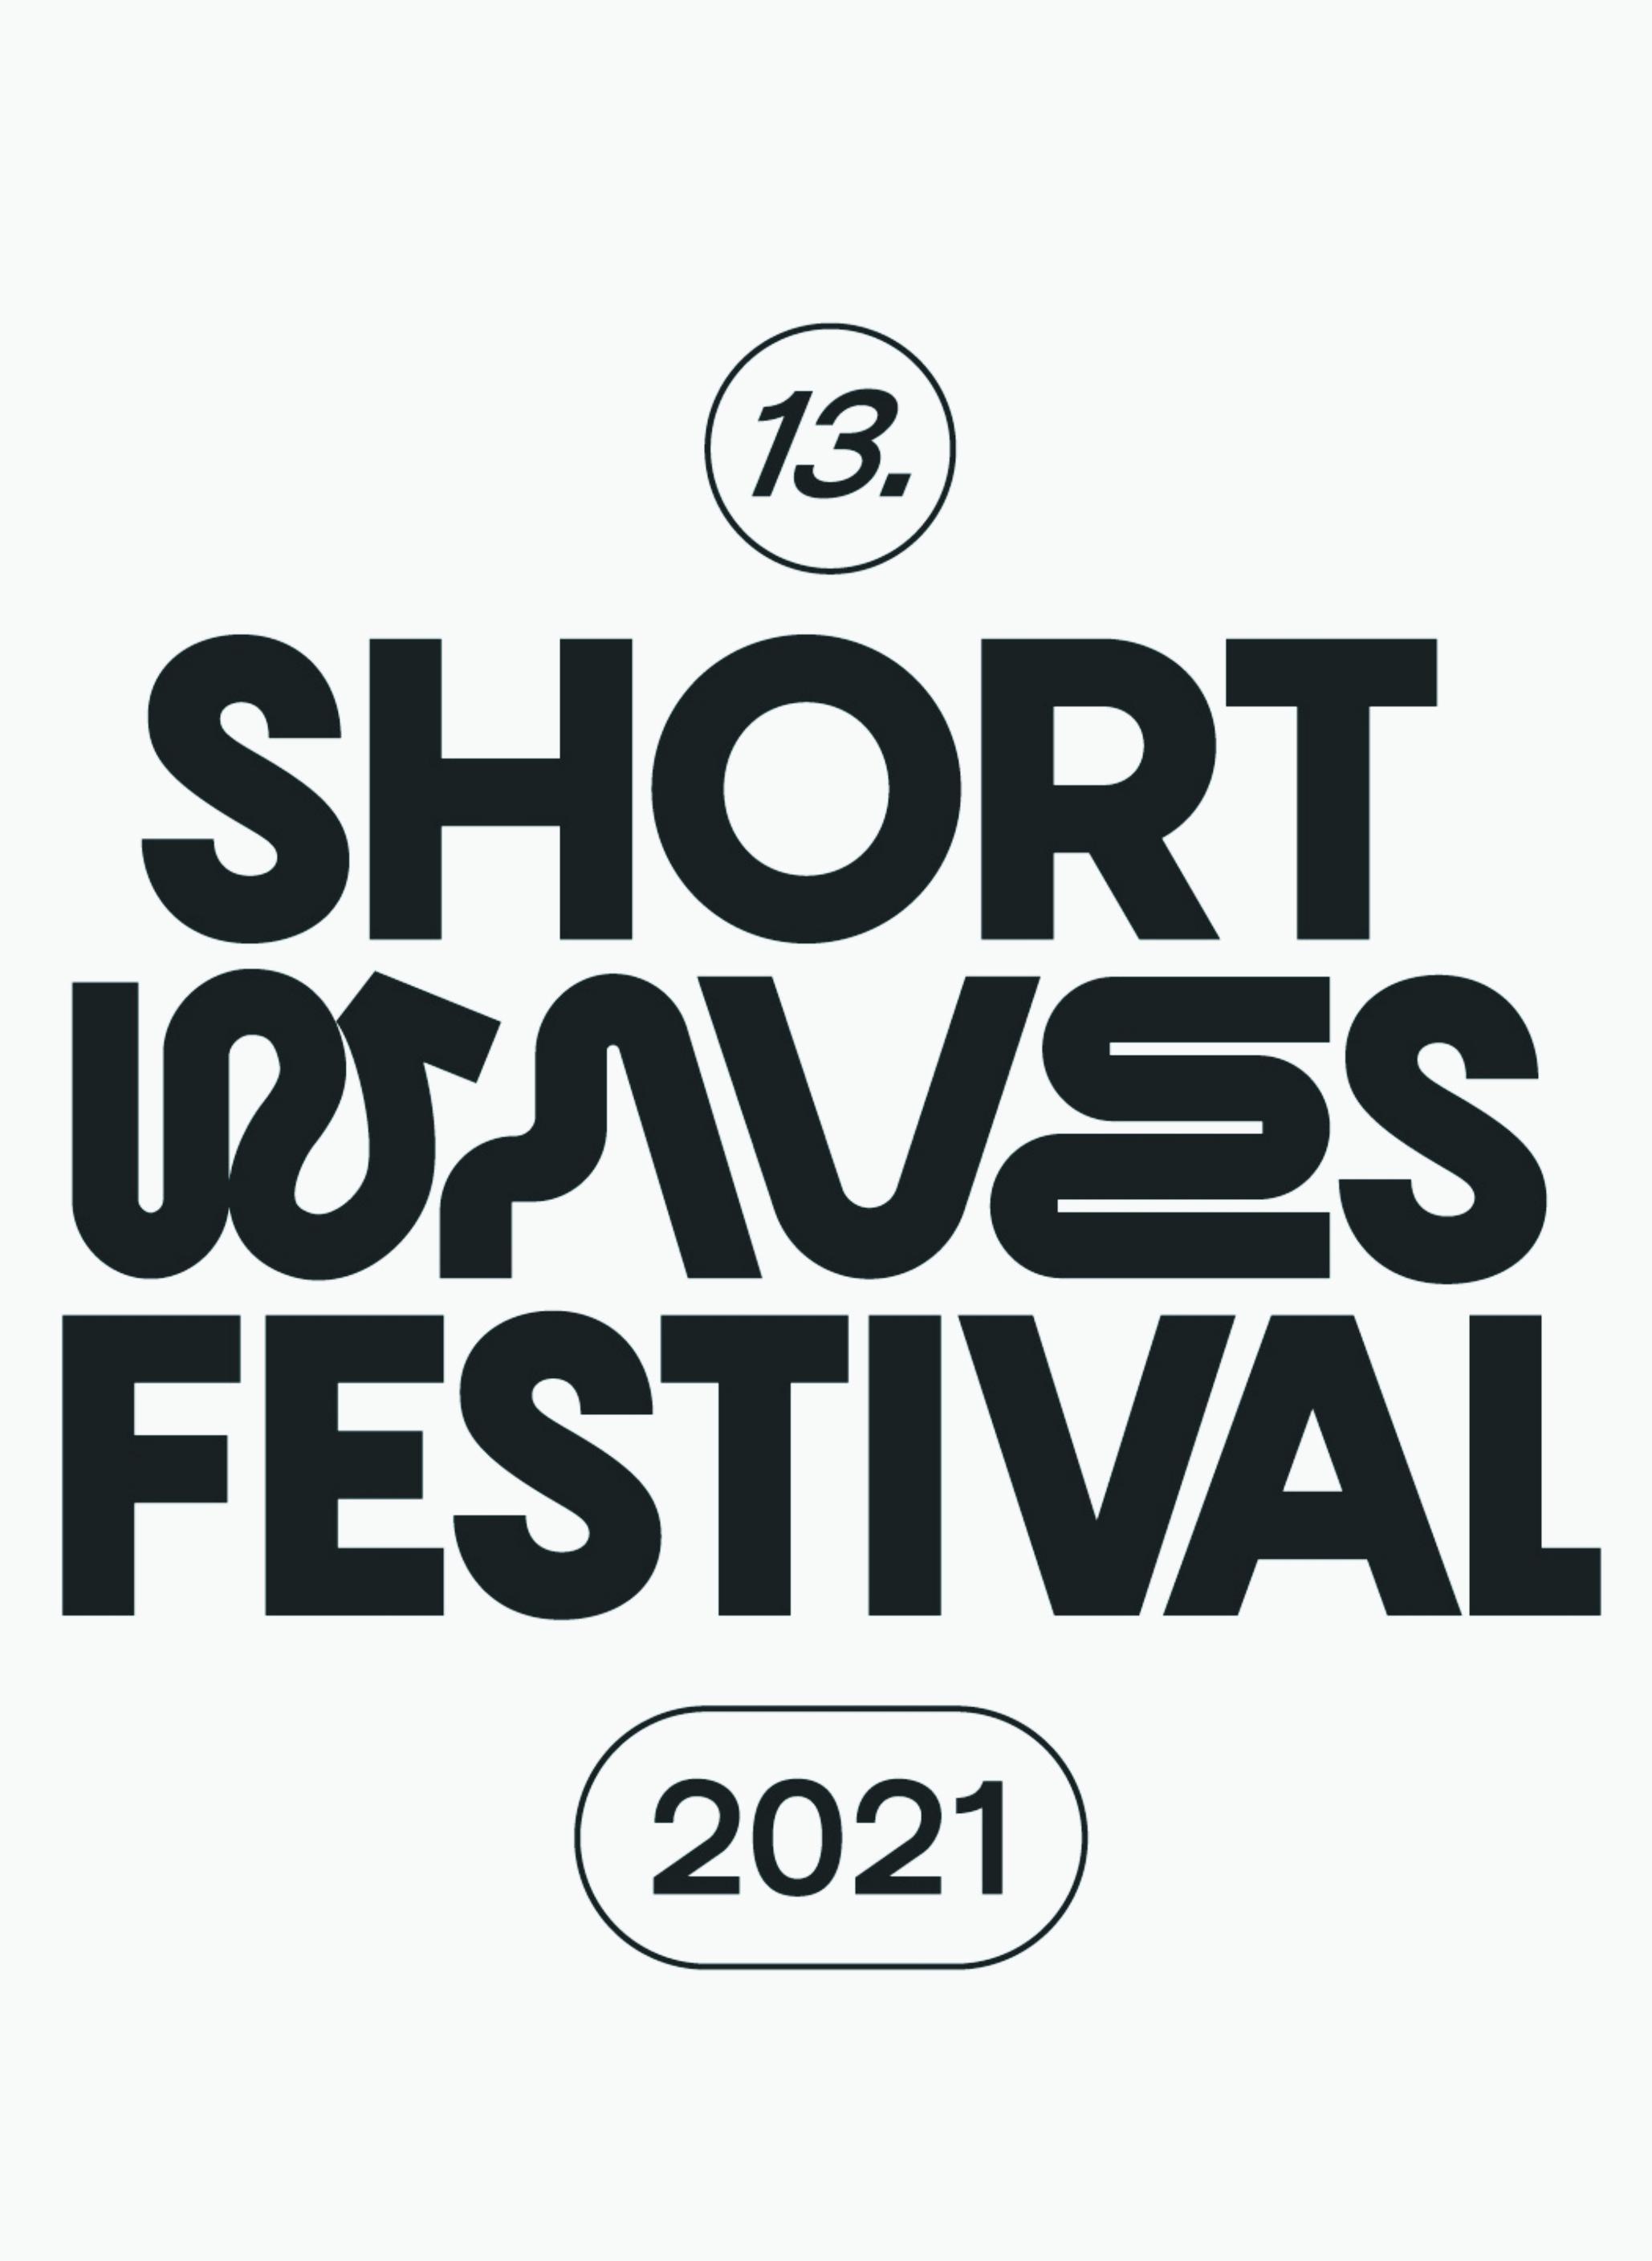 Short Waves Festival 2021 - Europejska Nagroda Publiczności II